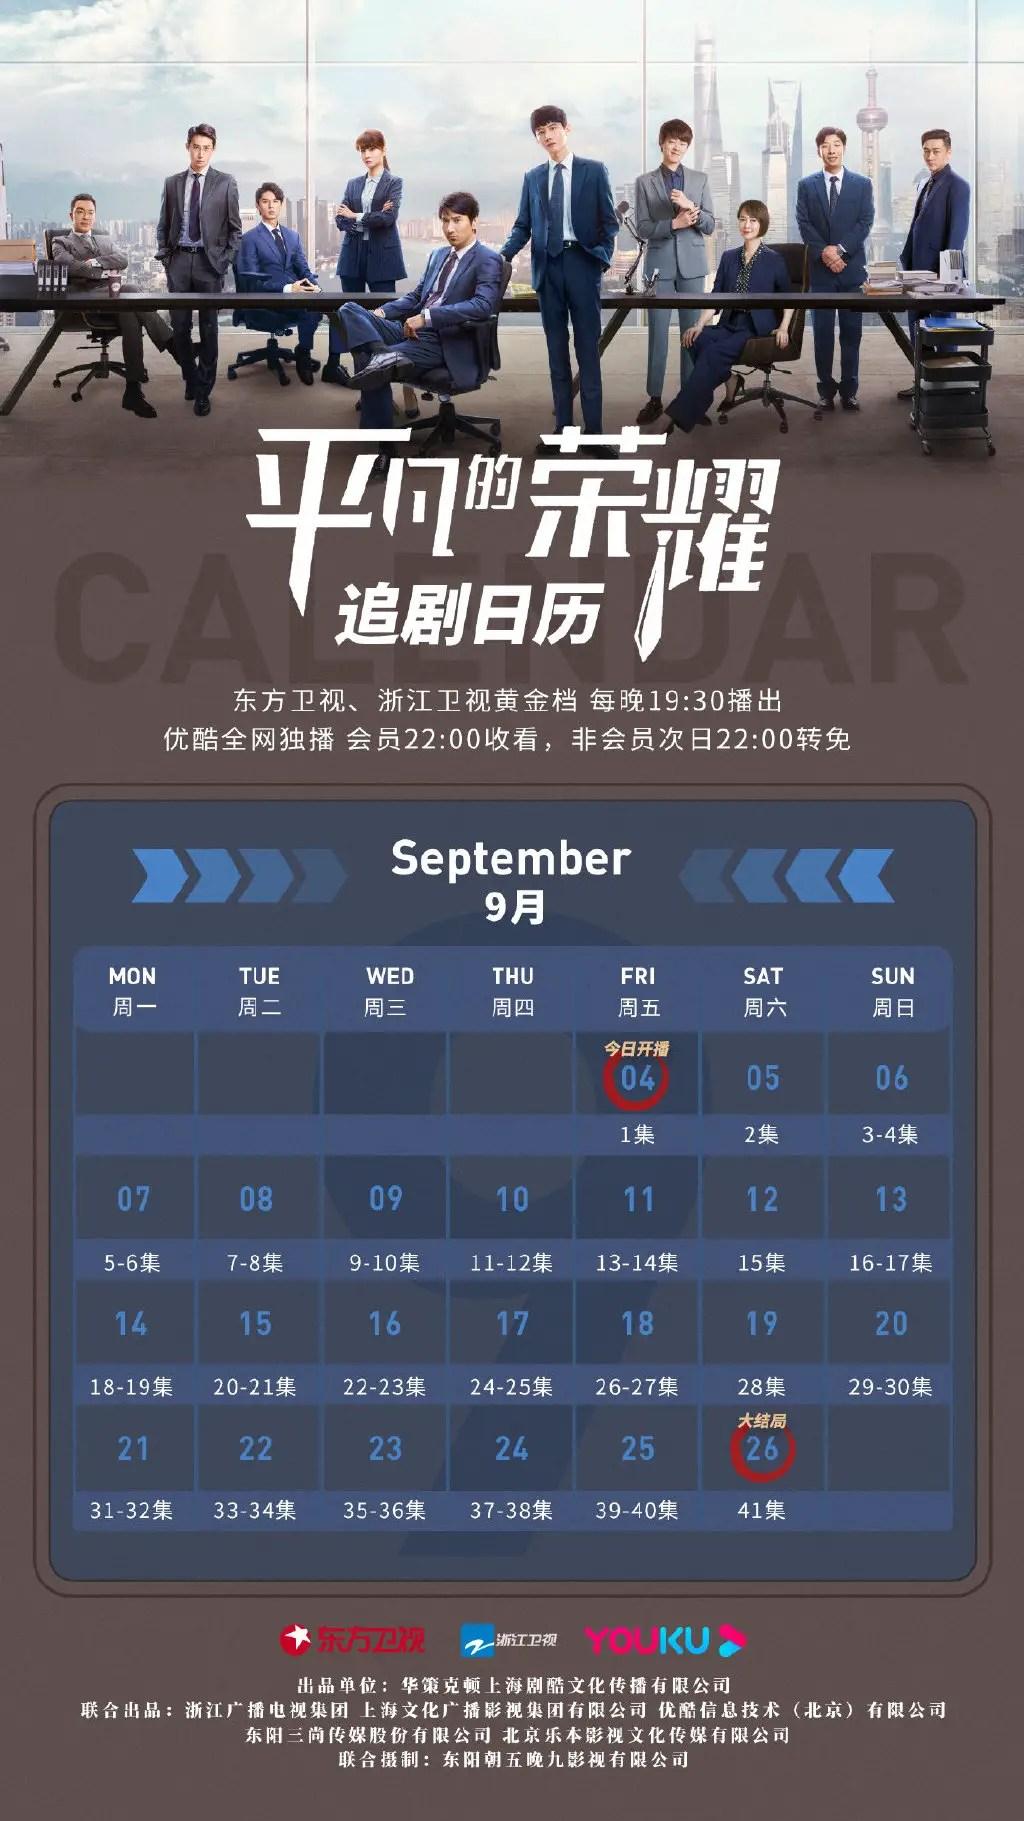 The Ordinary Glory Chinese Drama Airing Calendar